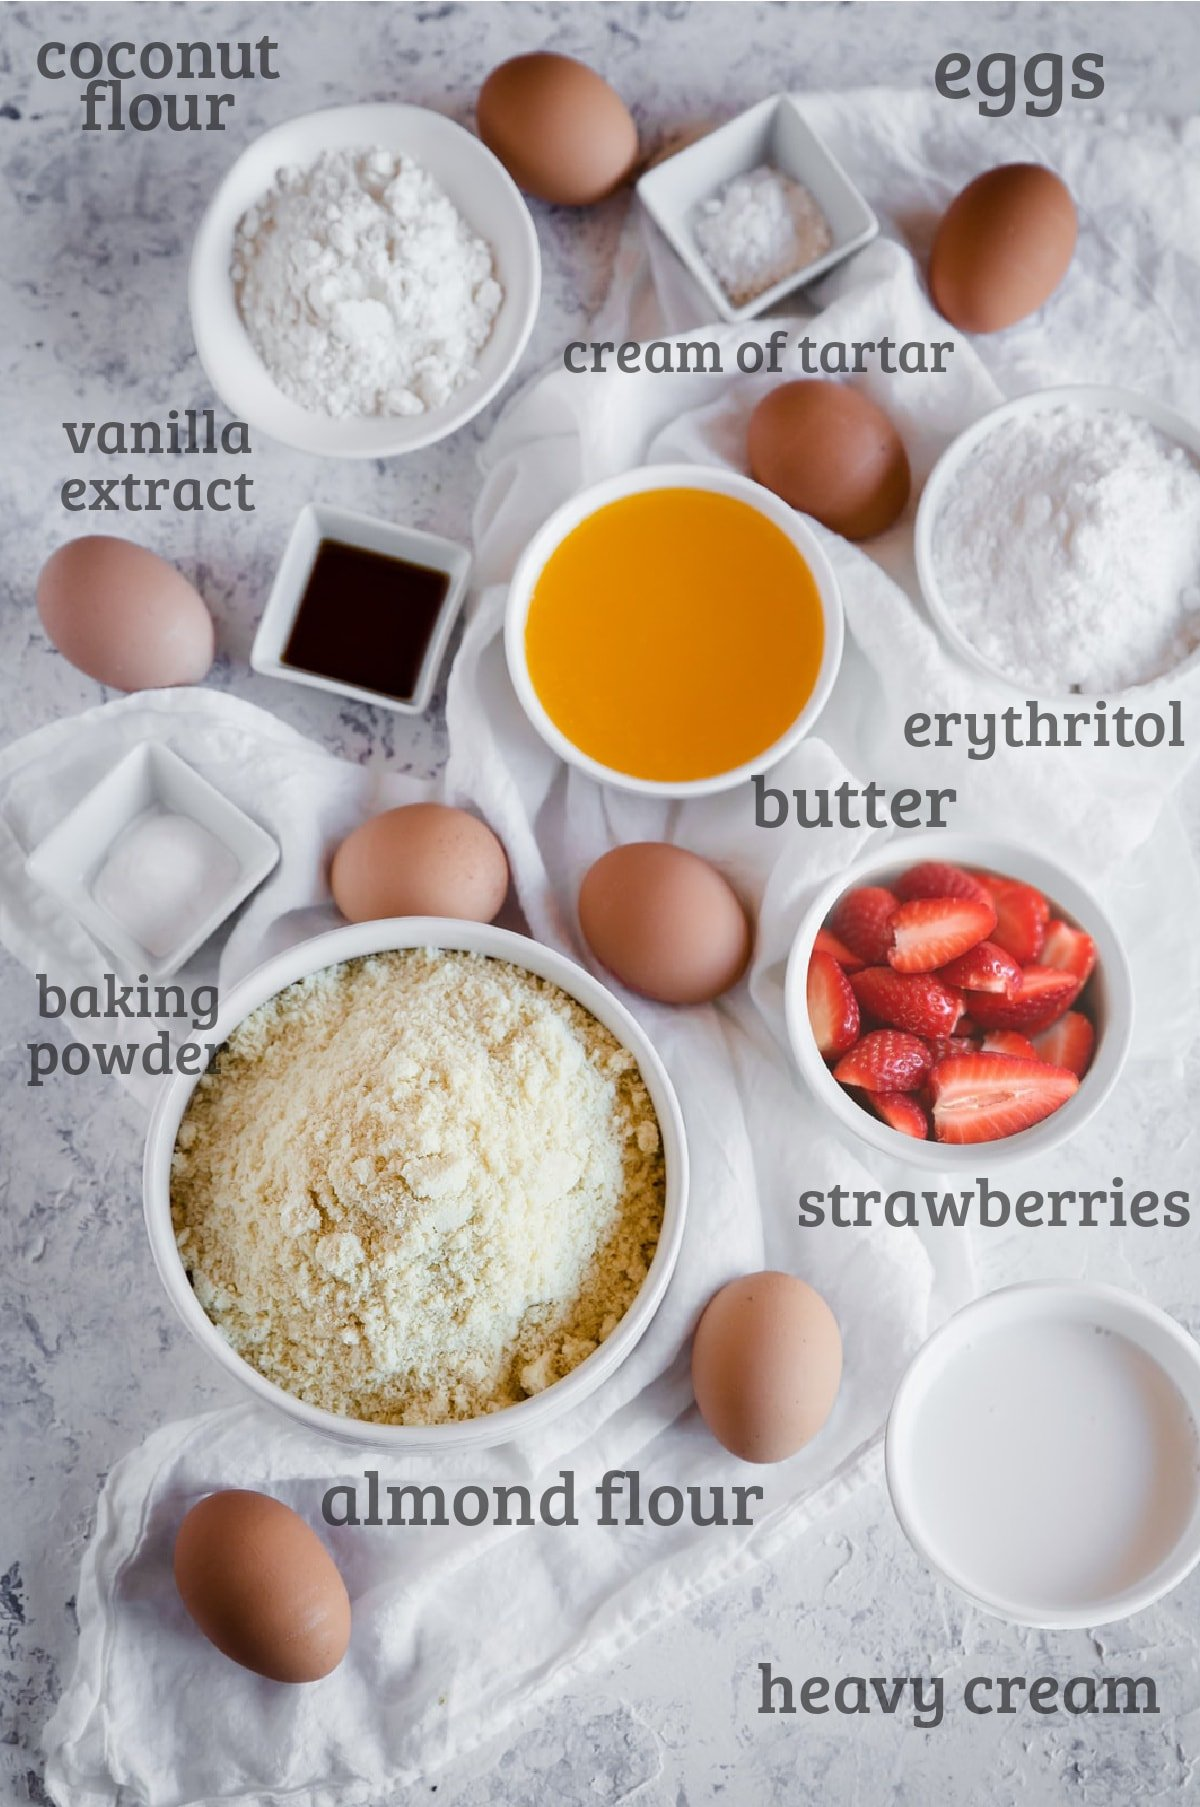 Ingredients for gluten free strawberry shortcake - eggs, butter, almond flour, sweetener, strawberries, heavy cream, vanilla,